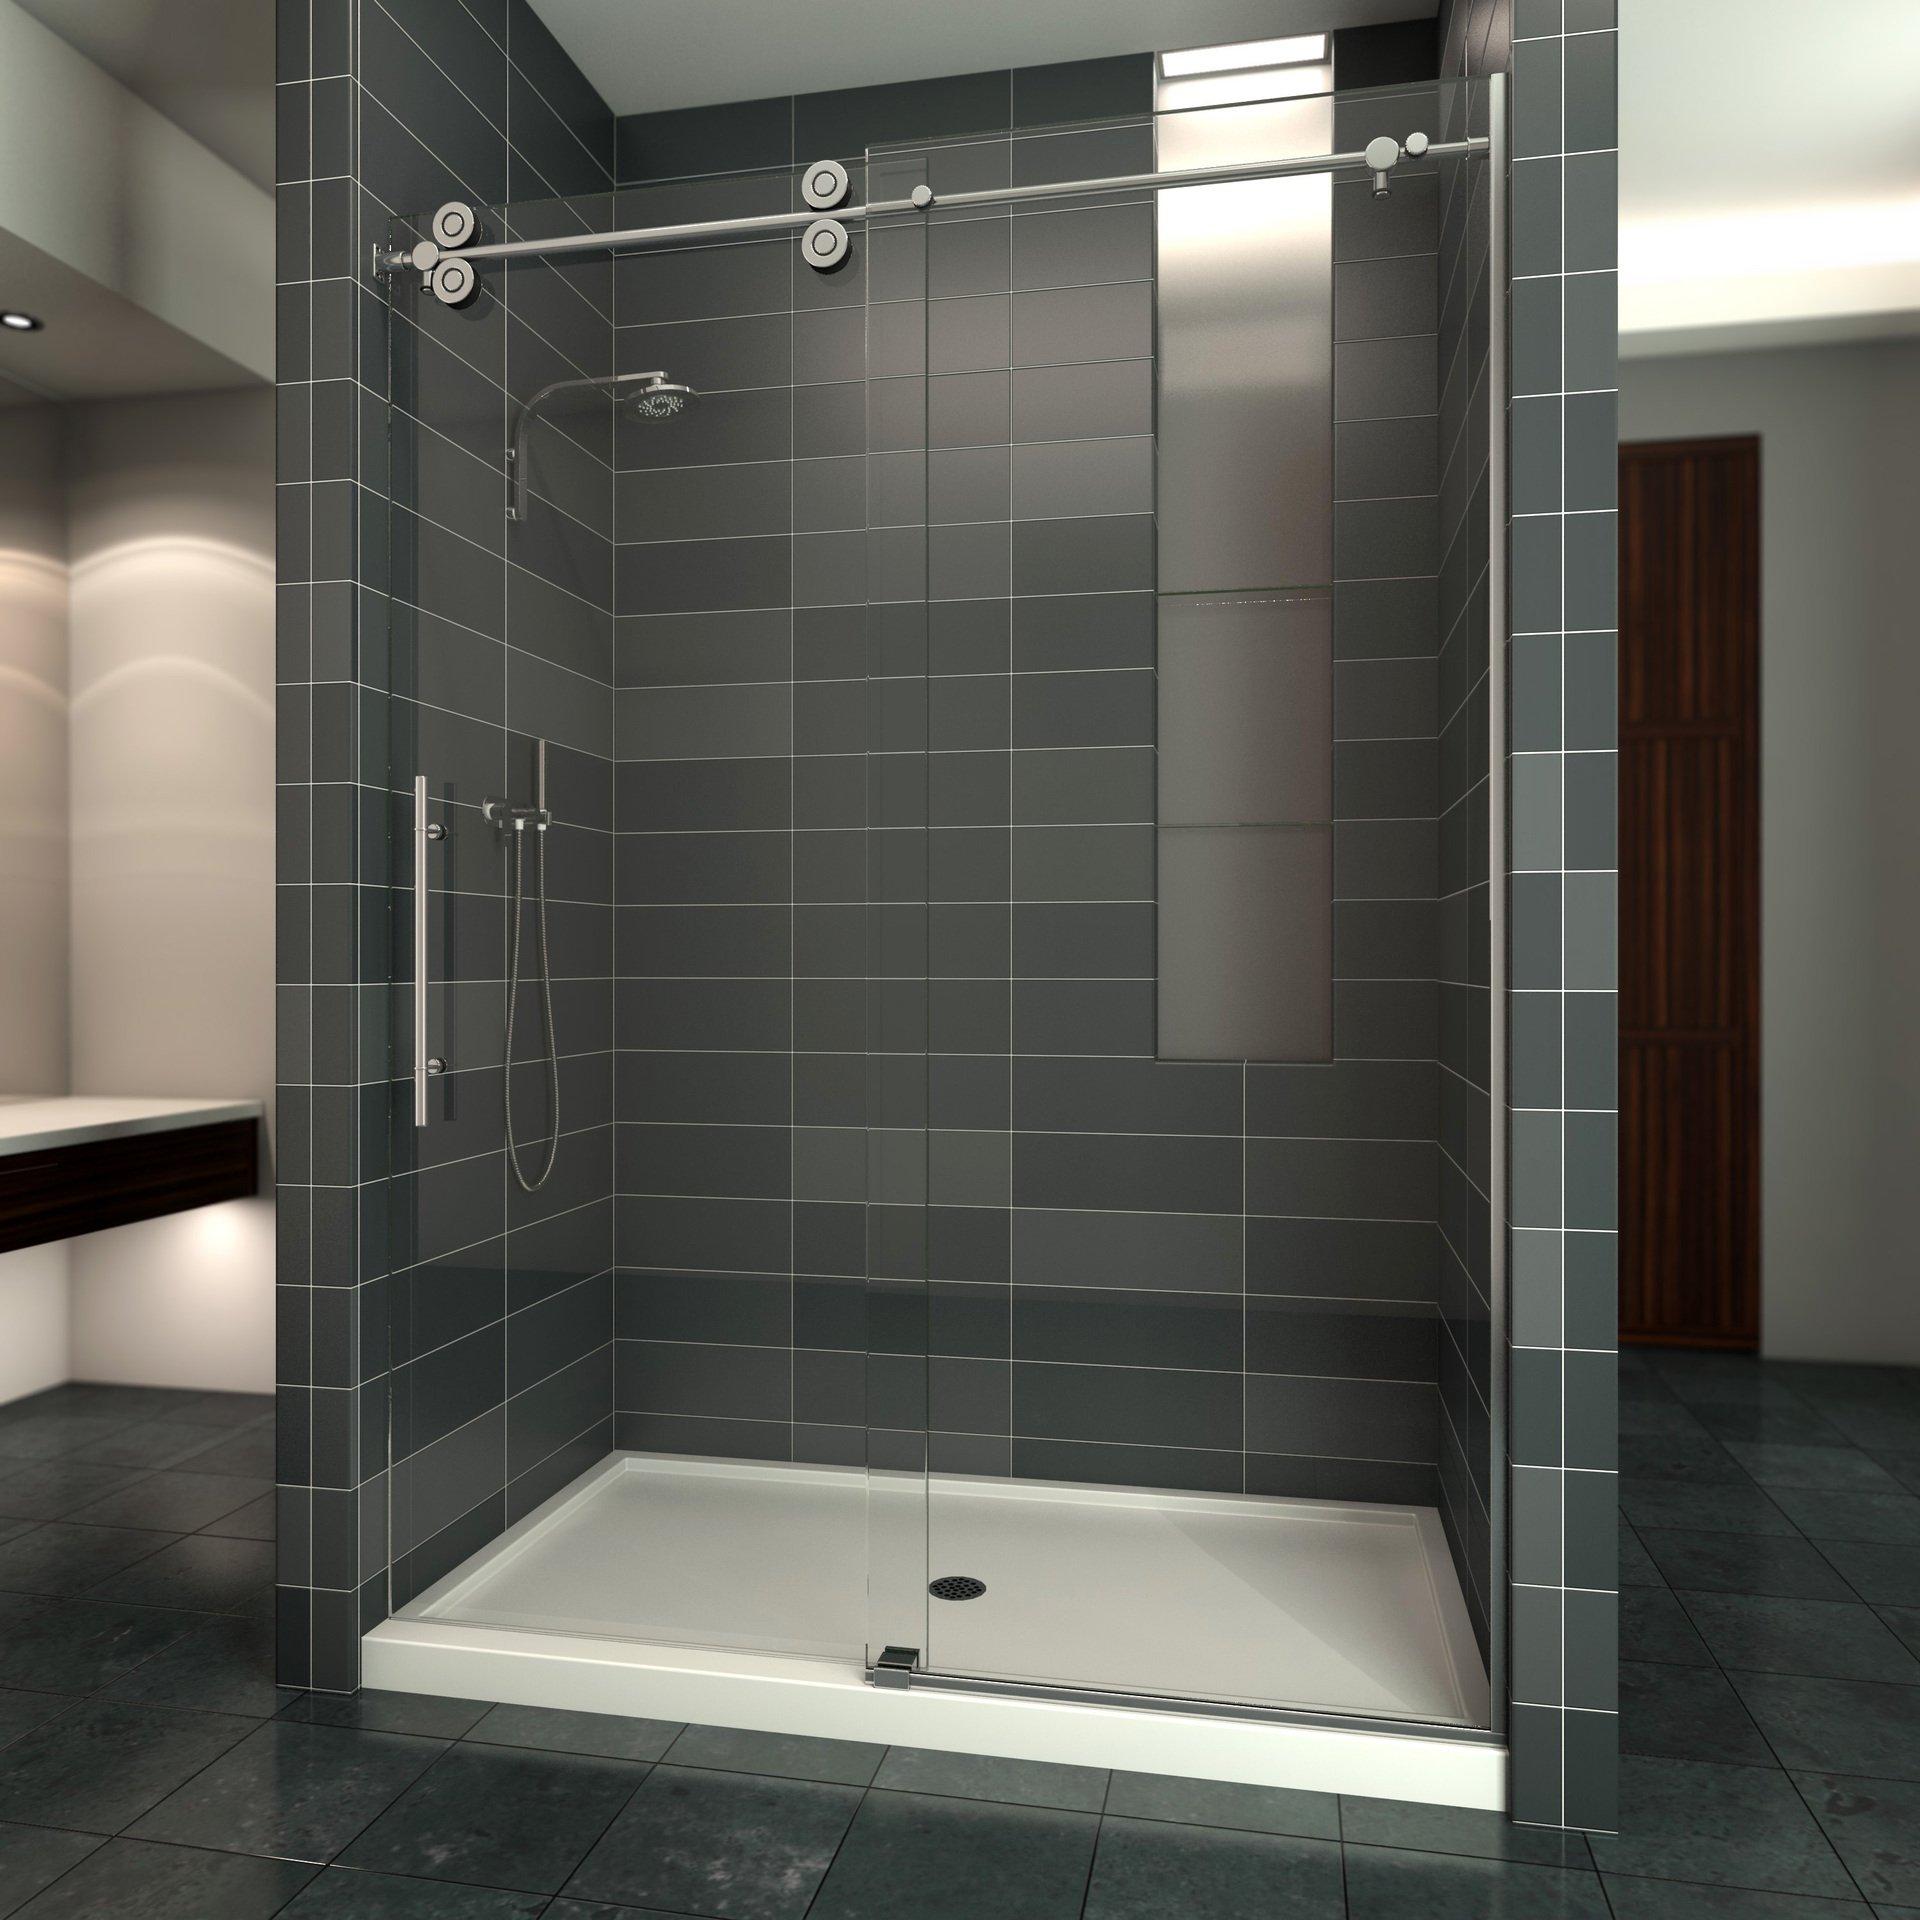 Custom shower door installed at the residence in Lake Havasu City